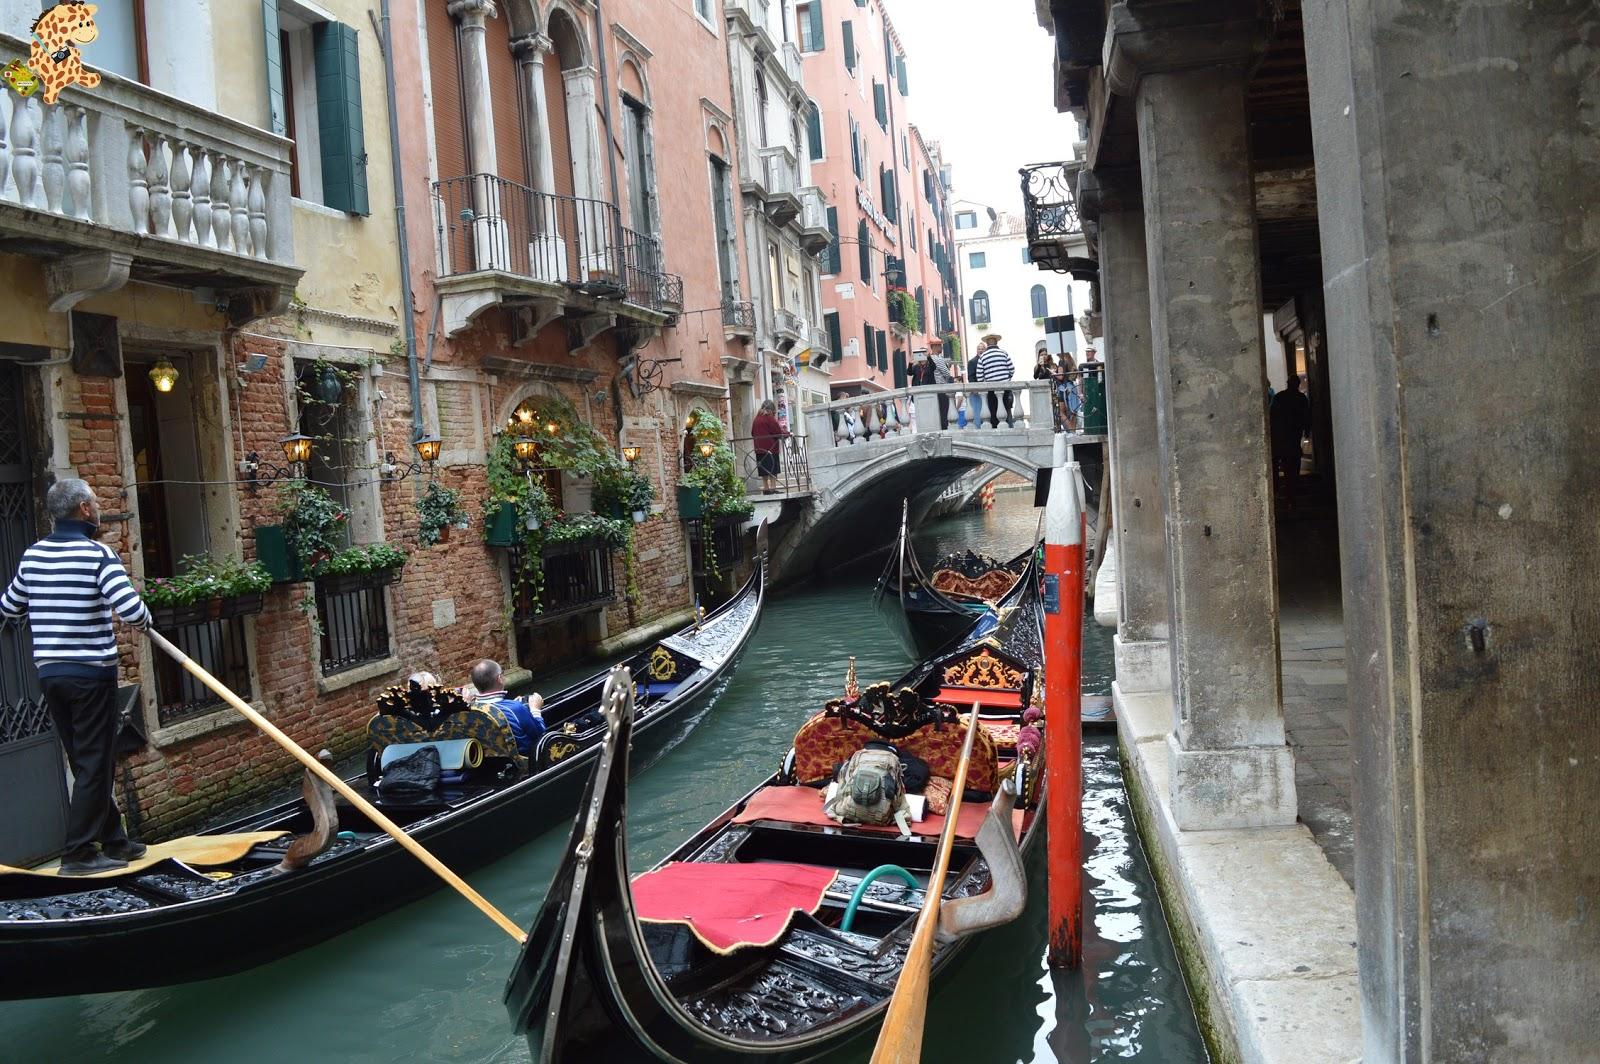 queverenveneciaen1dia281829 - Venecia en 1 día